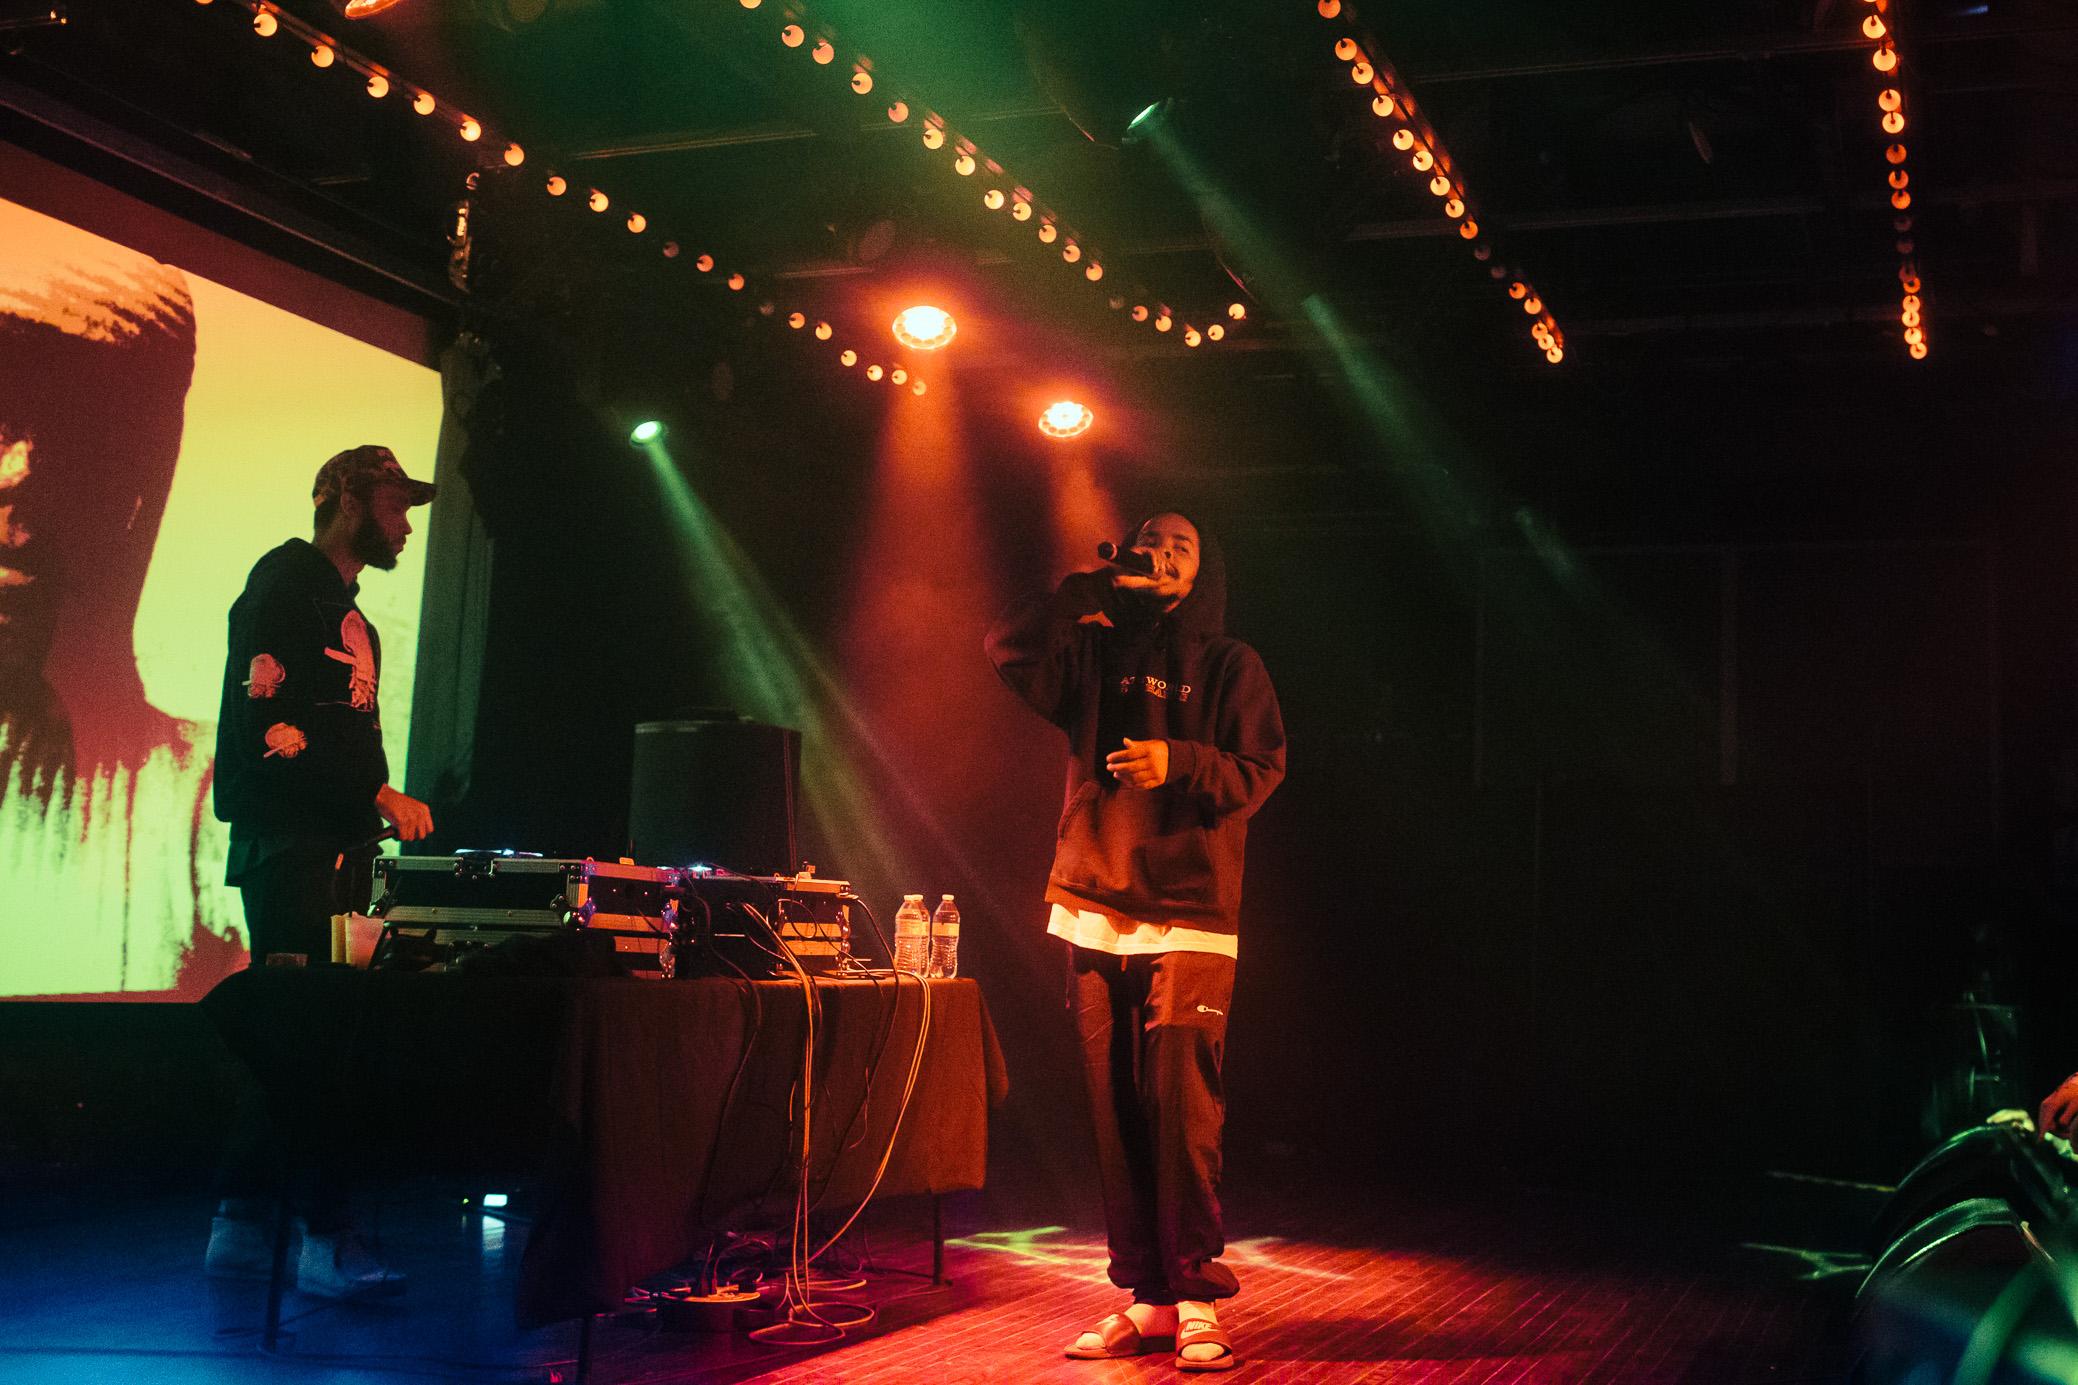 Earl Sweatshirt performs in concert at Saturn Birmingham in Birmingham, Alabama on May 5th, 2019. (Photo by David A. Smith / DSmithScenes)